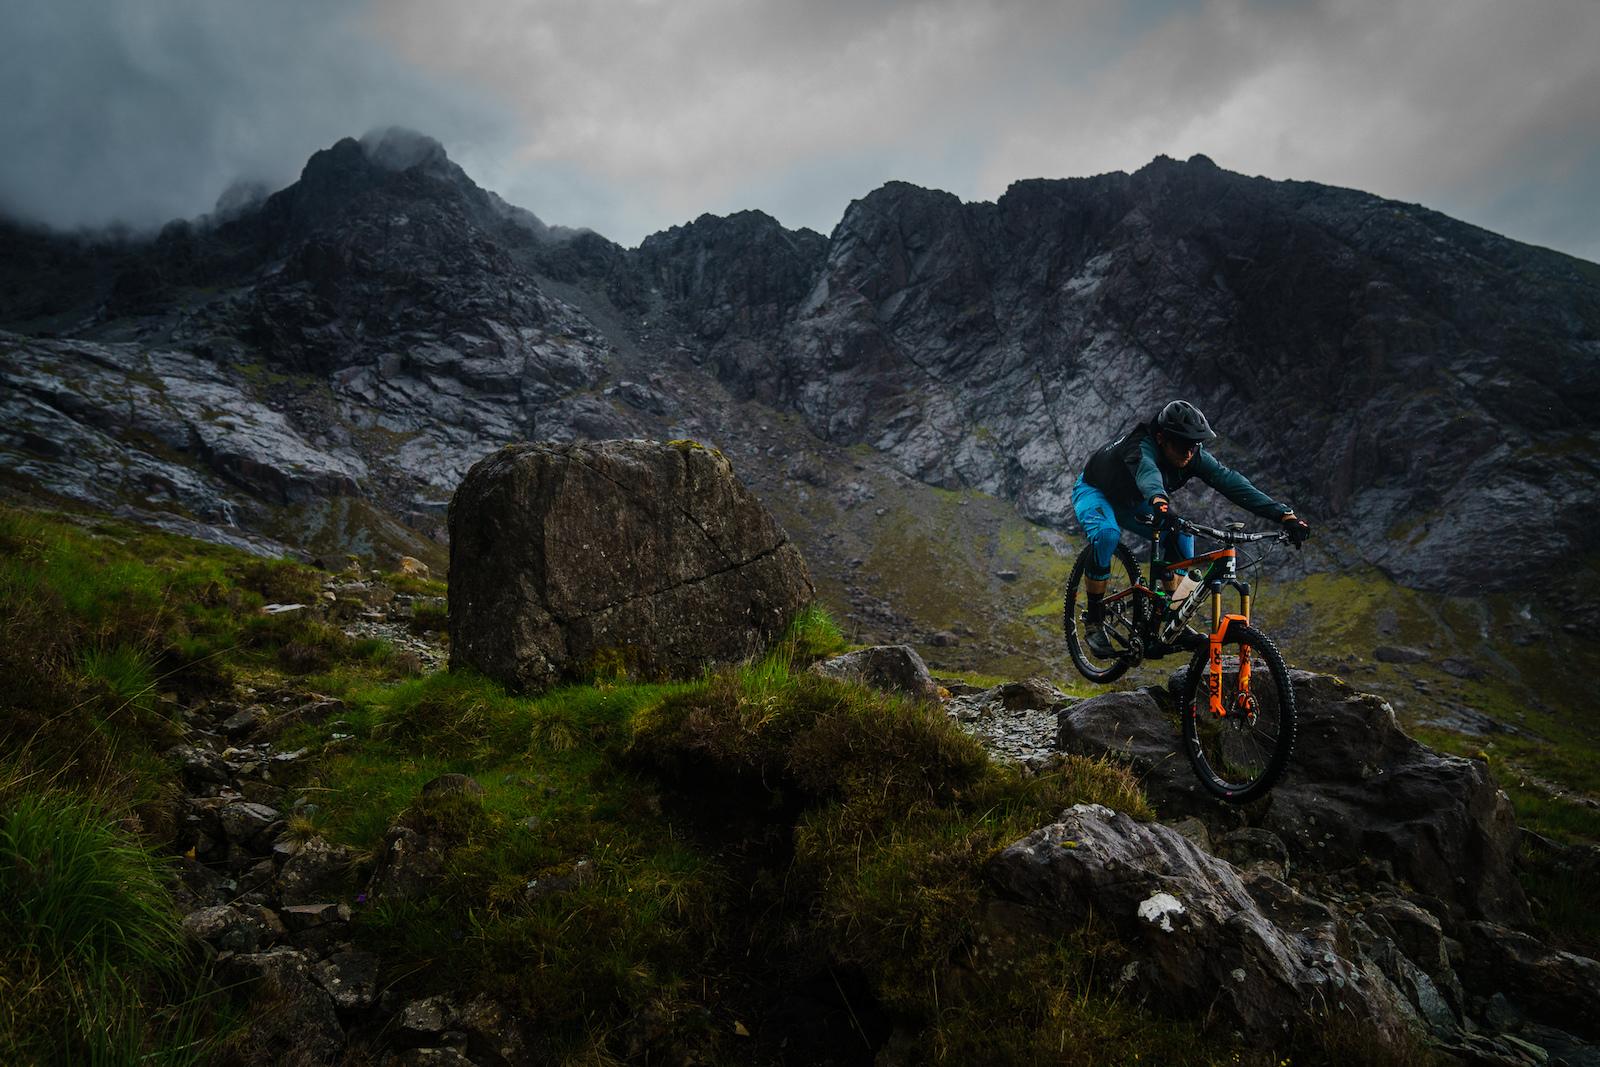 Greg Callaghan on Skye in Scotland June 2017. Photo by Matt Wragg